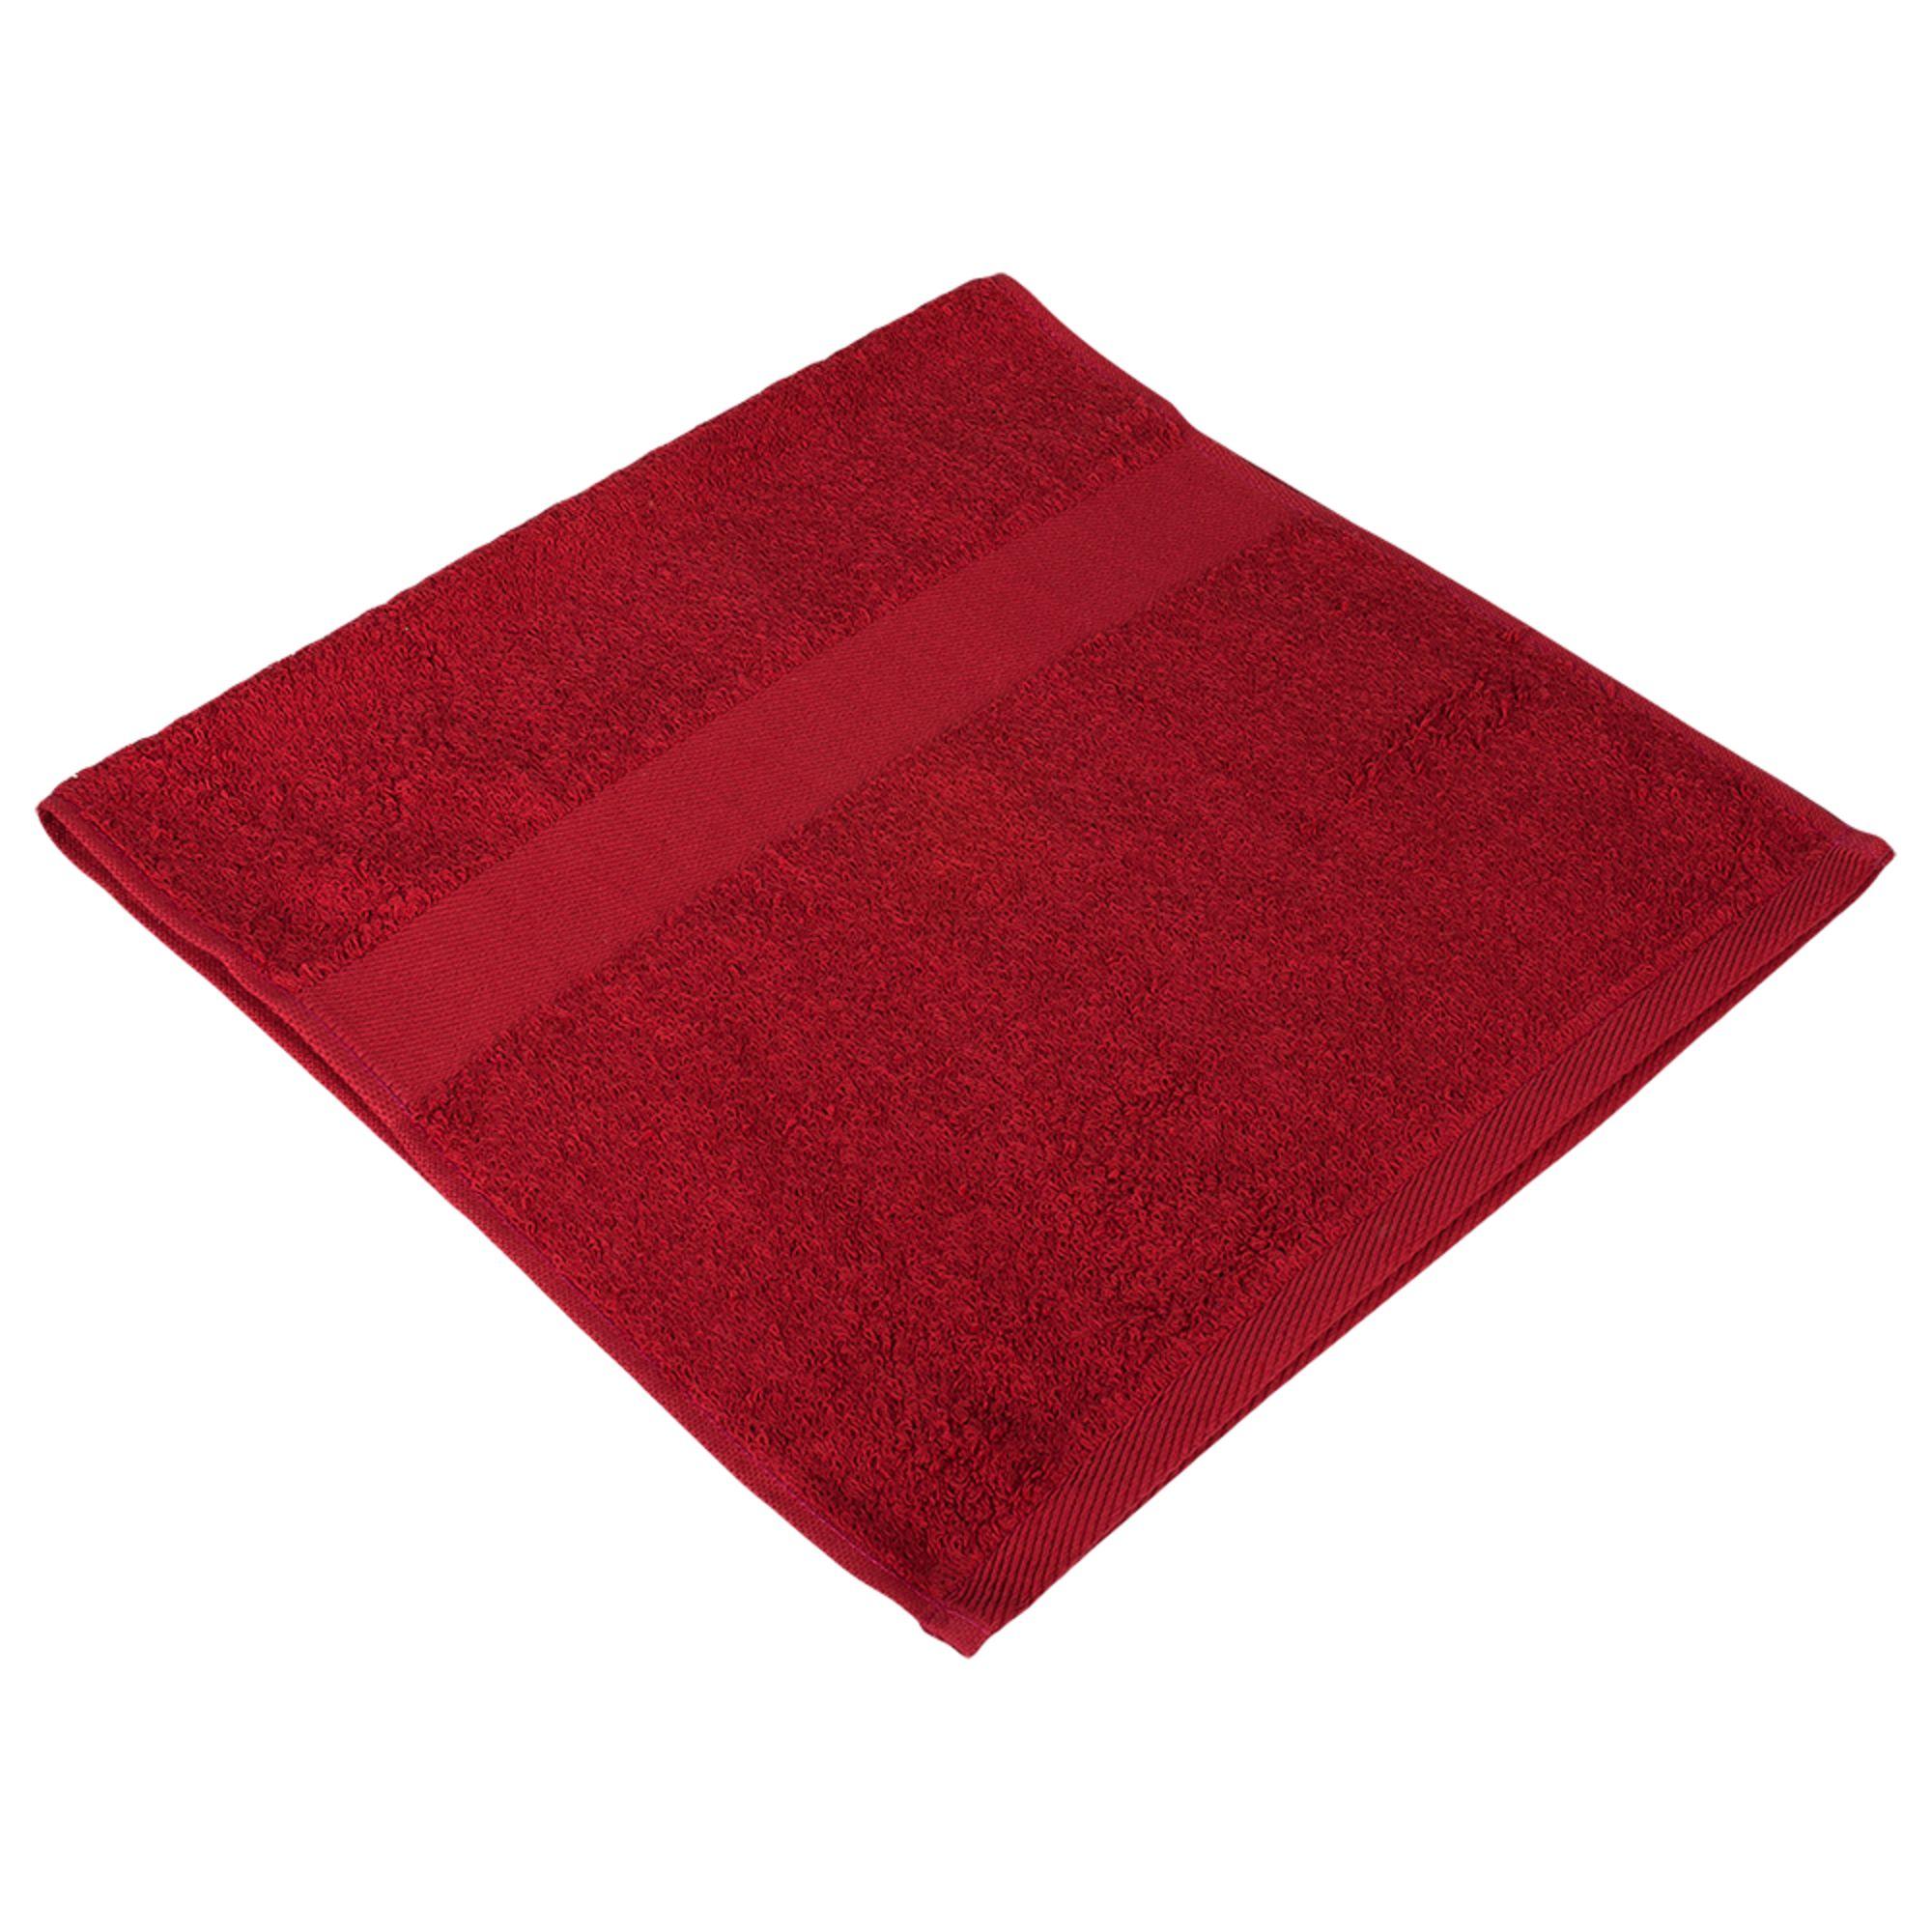 Полотенце махровое Small, бордовое